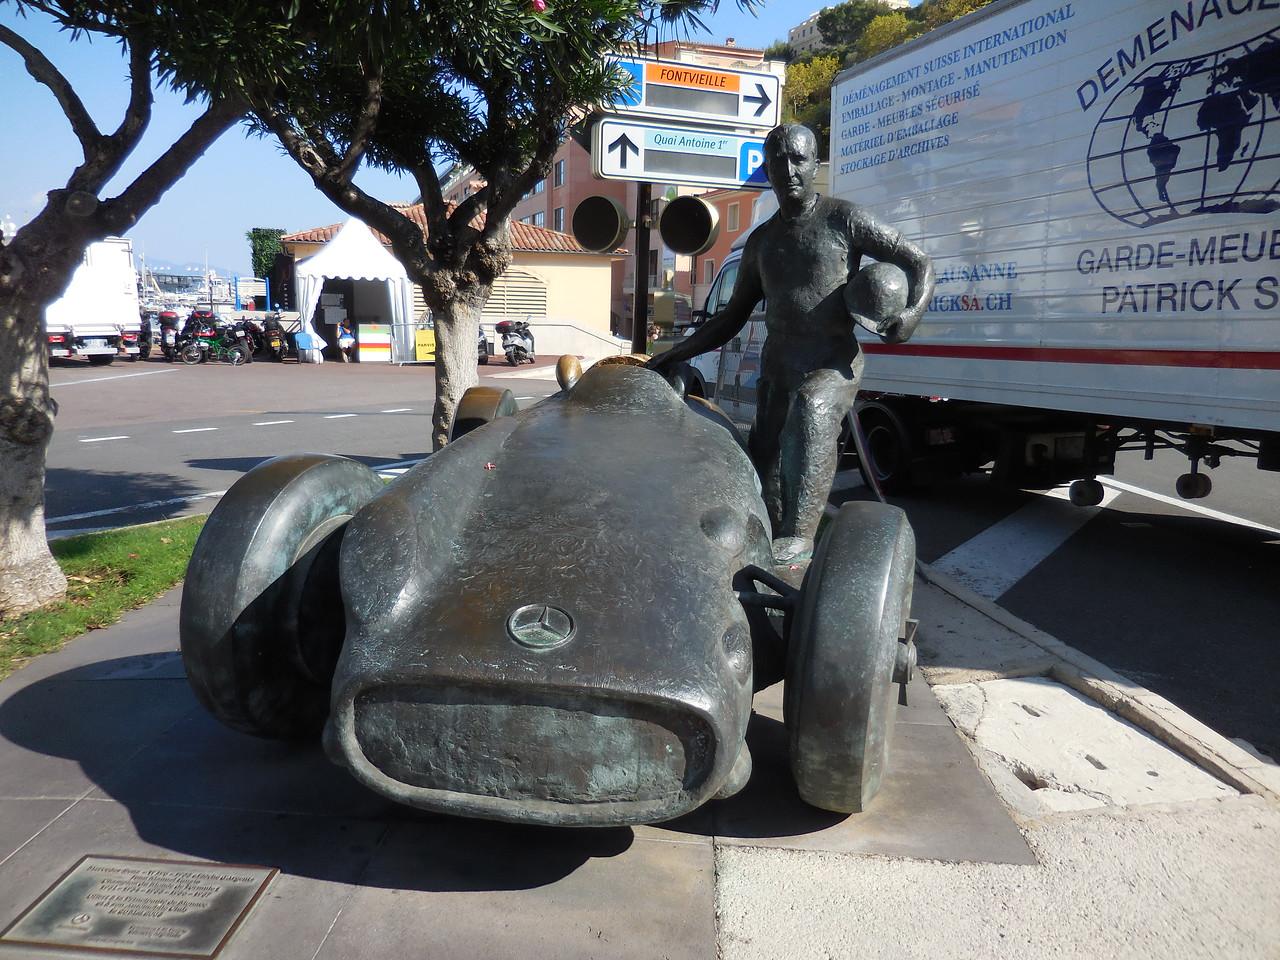 Statue honoring Juan Manel Fango, the Grand Prix winner in 1955.